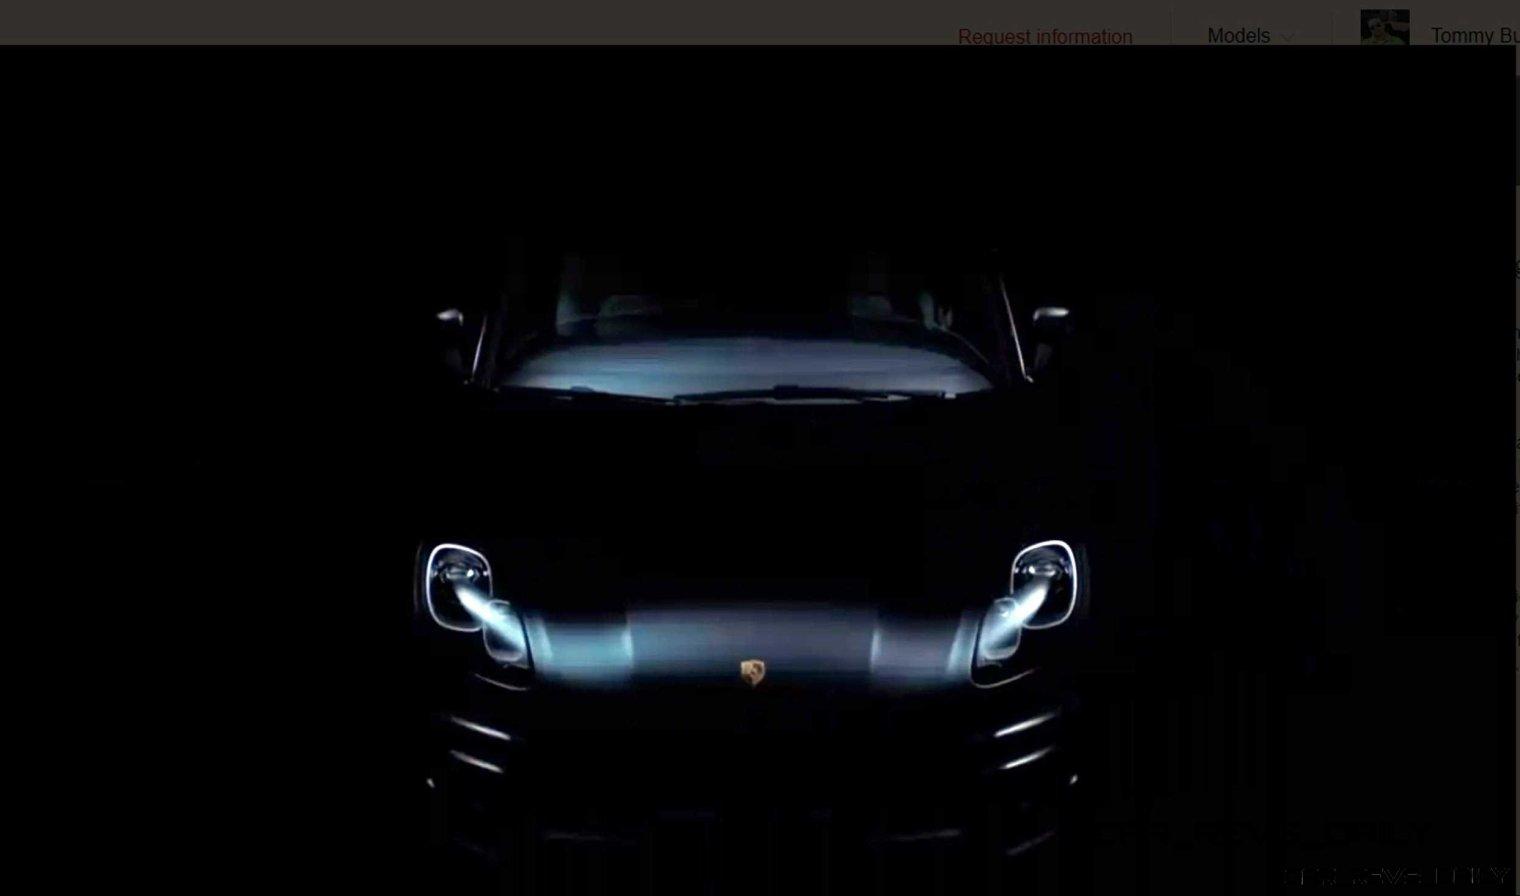 2015 Porsche Macan - Latest Images - CarRevsDaily.com 32